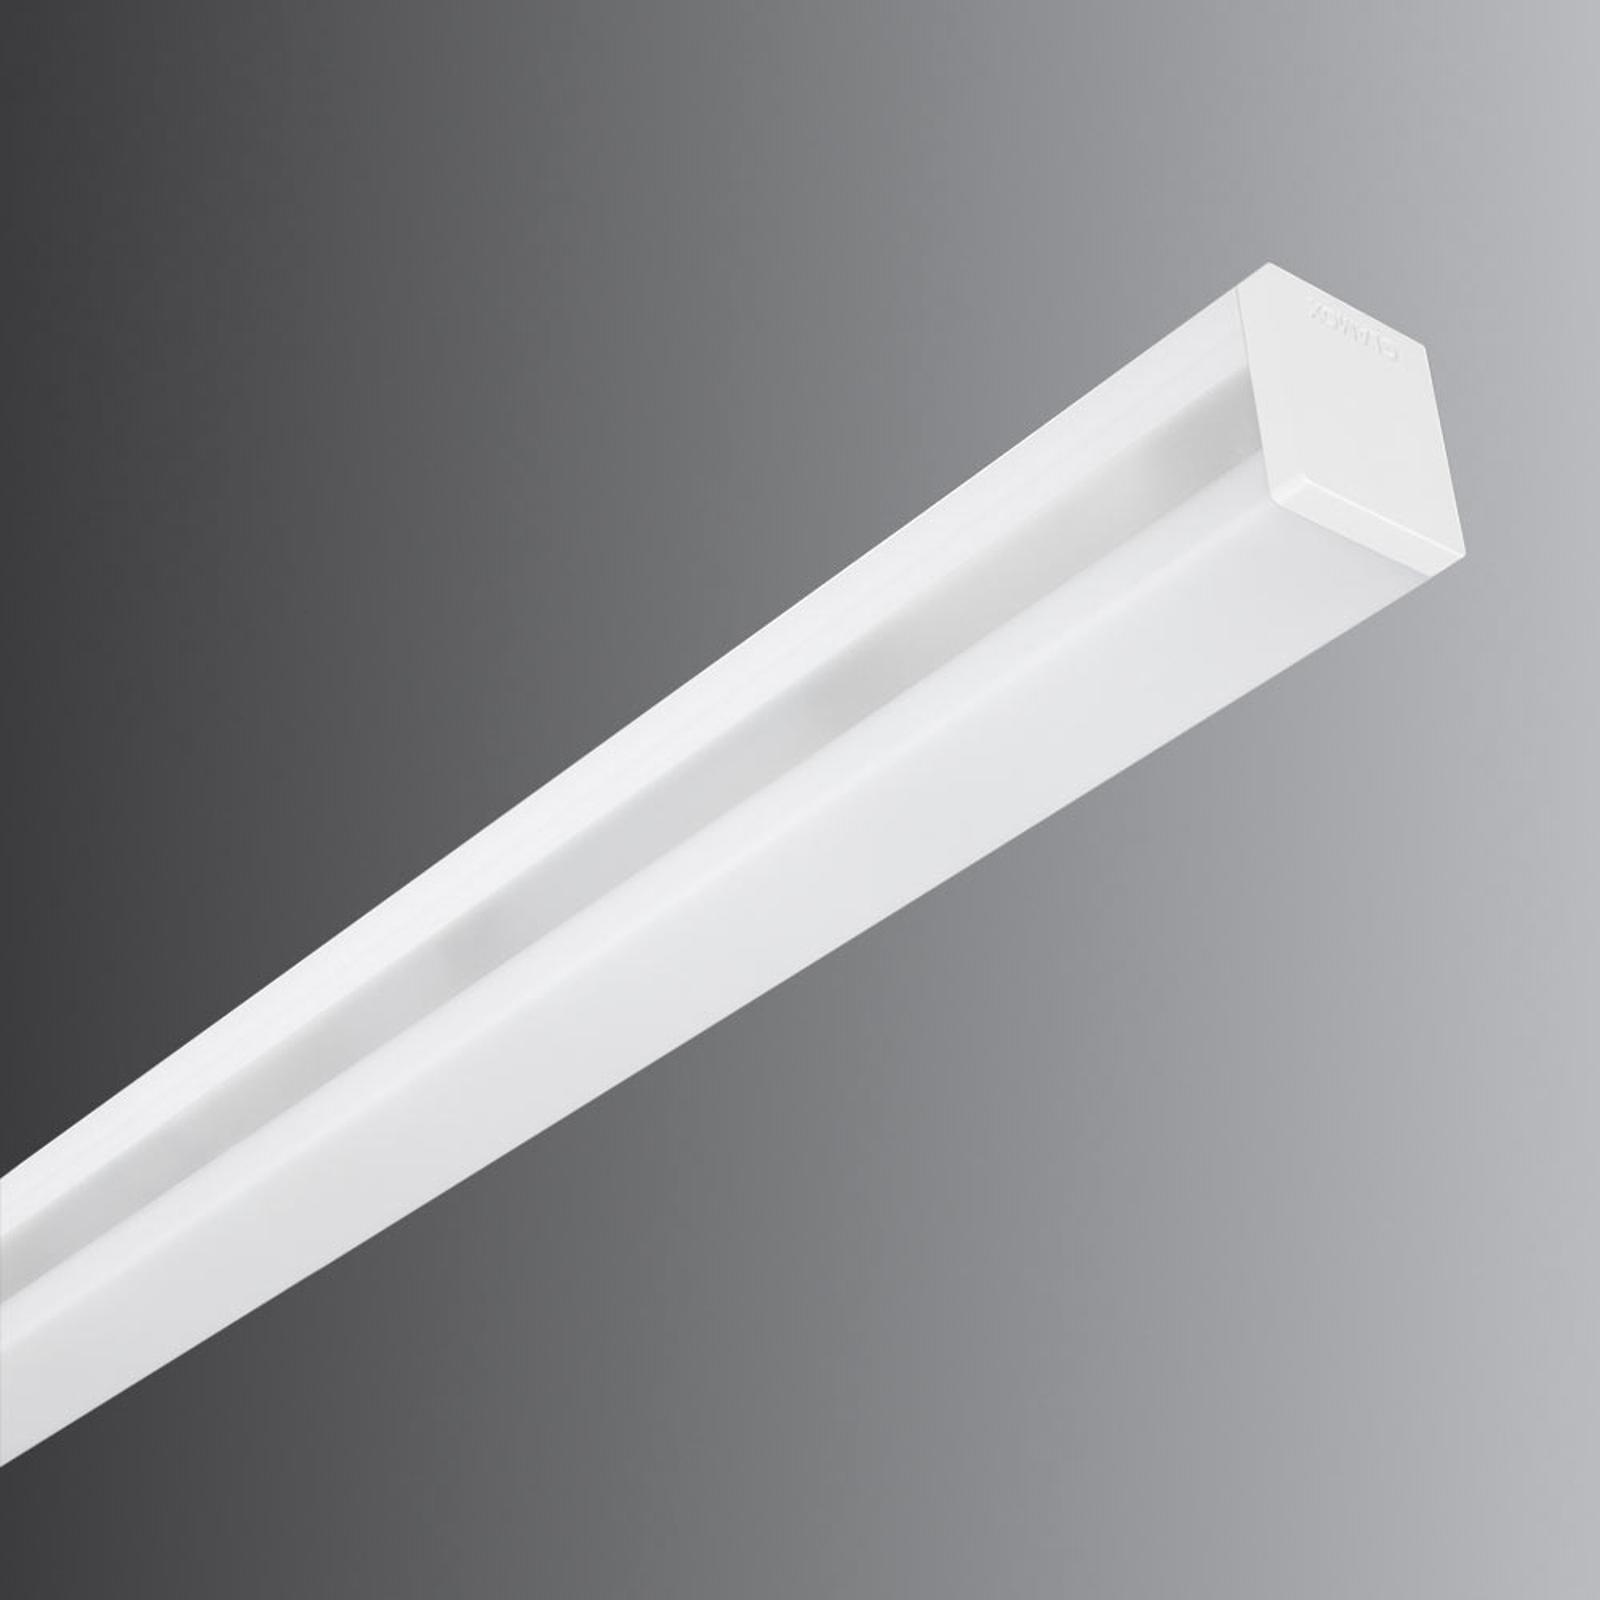 Acquista 16 W luce a LED A40-W1200 2100HF 120 cm